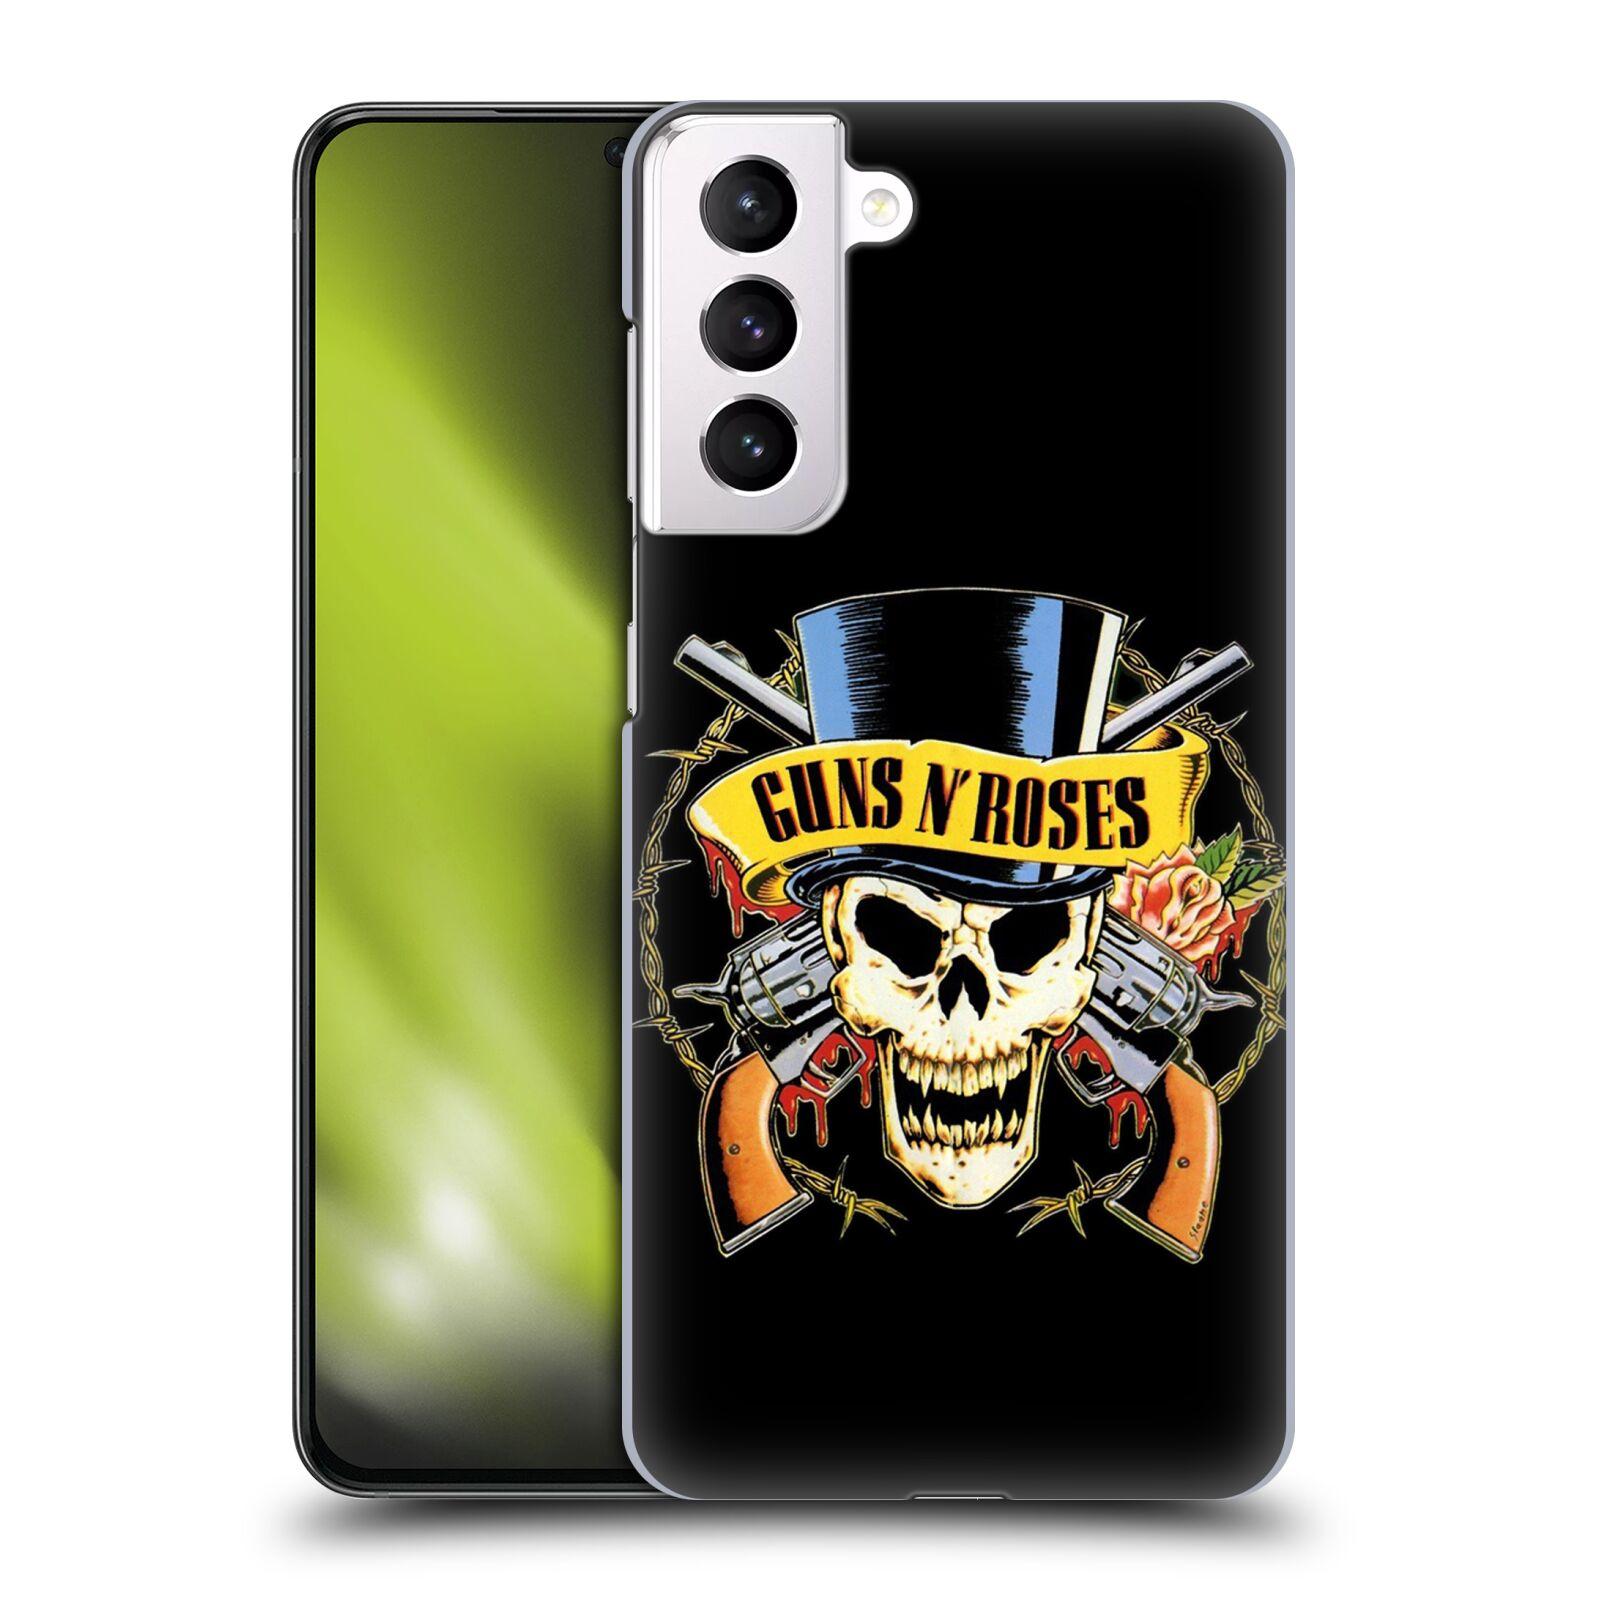 Plastové pouzdro na mobil Samsung Galaxy S21 Plus 5G - Head Case - Guns N' Roses - Lebka